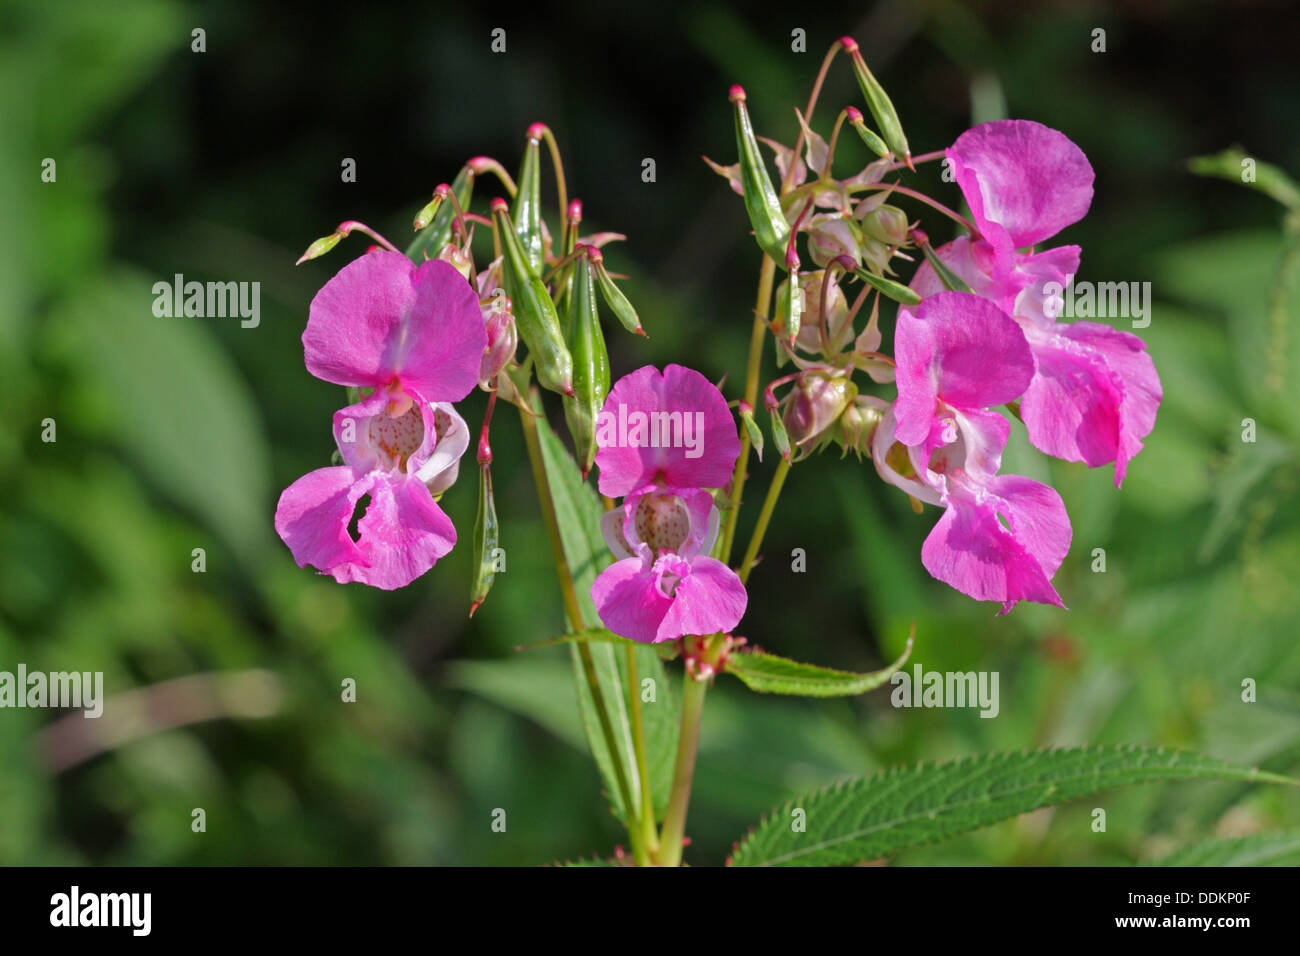 Balsamine de l'Himalaya, Impatiens glandulifera, Close-up of flowers, Lea Valley, Essex, UK Banque D'Images